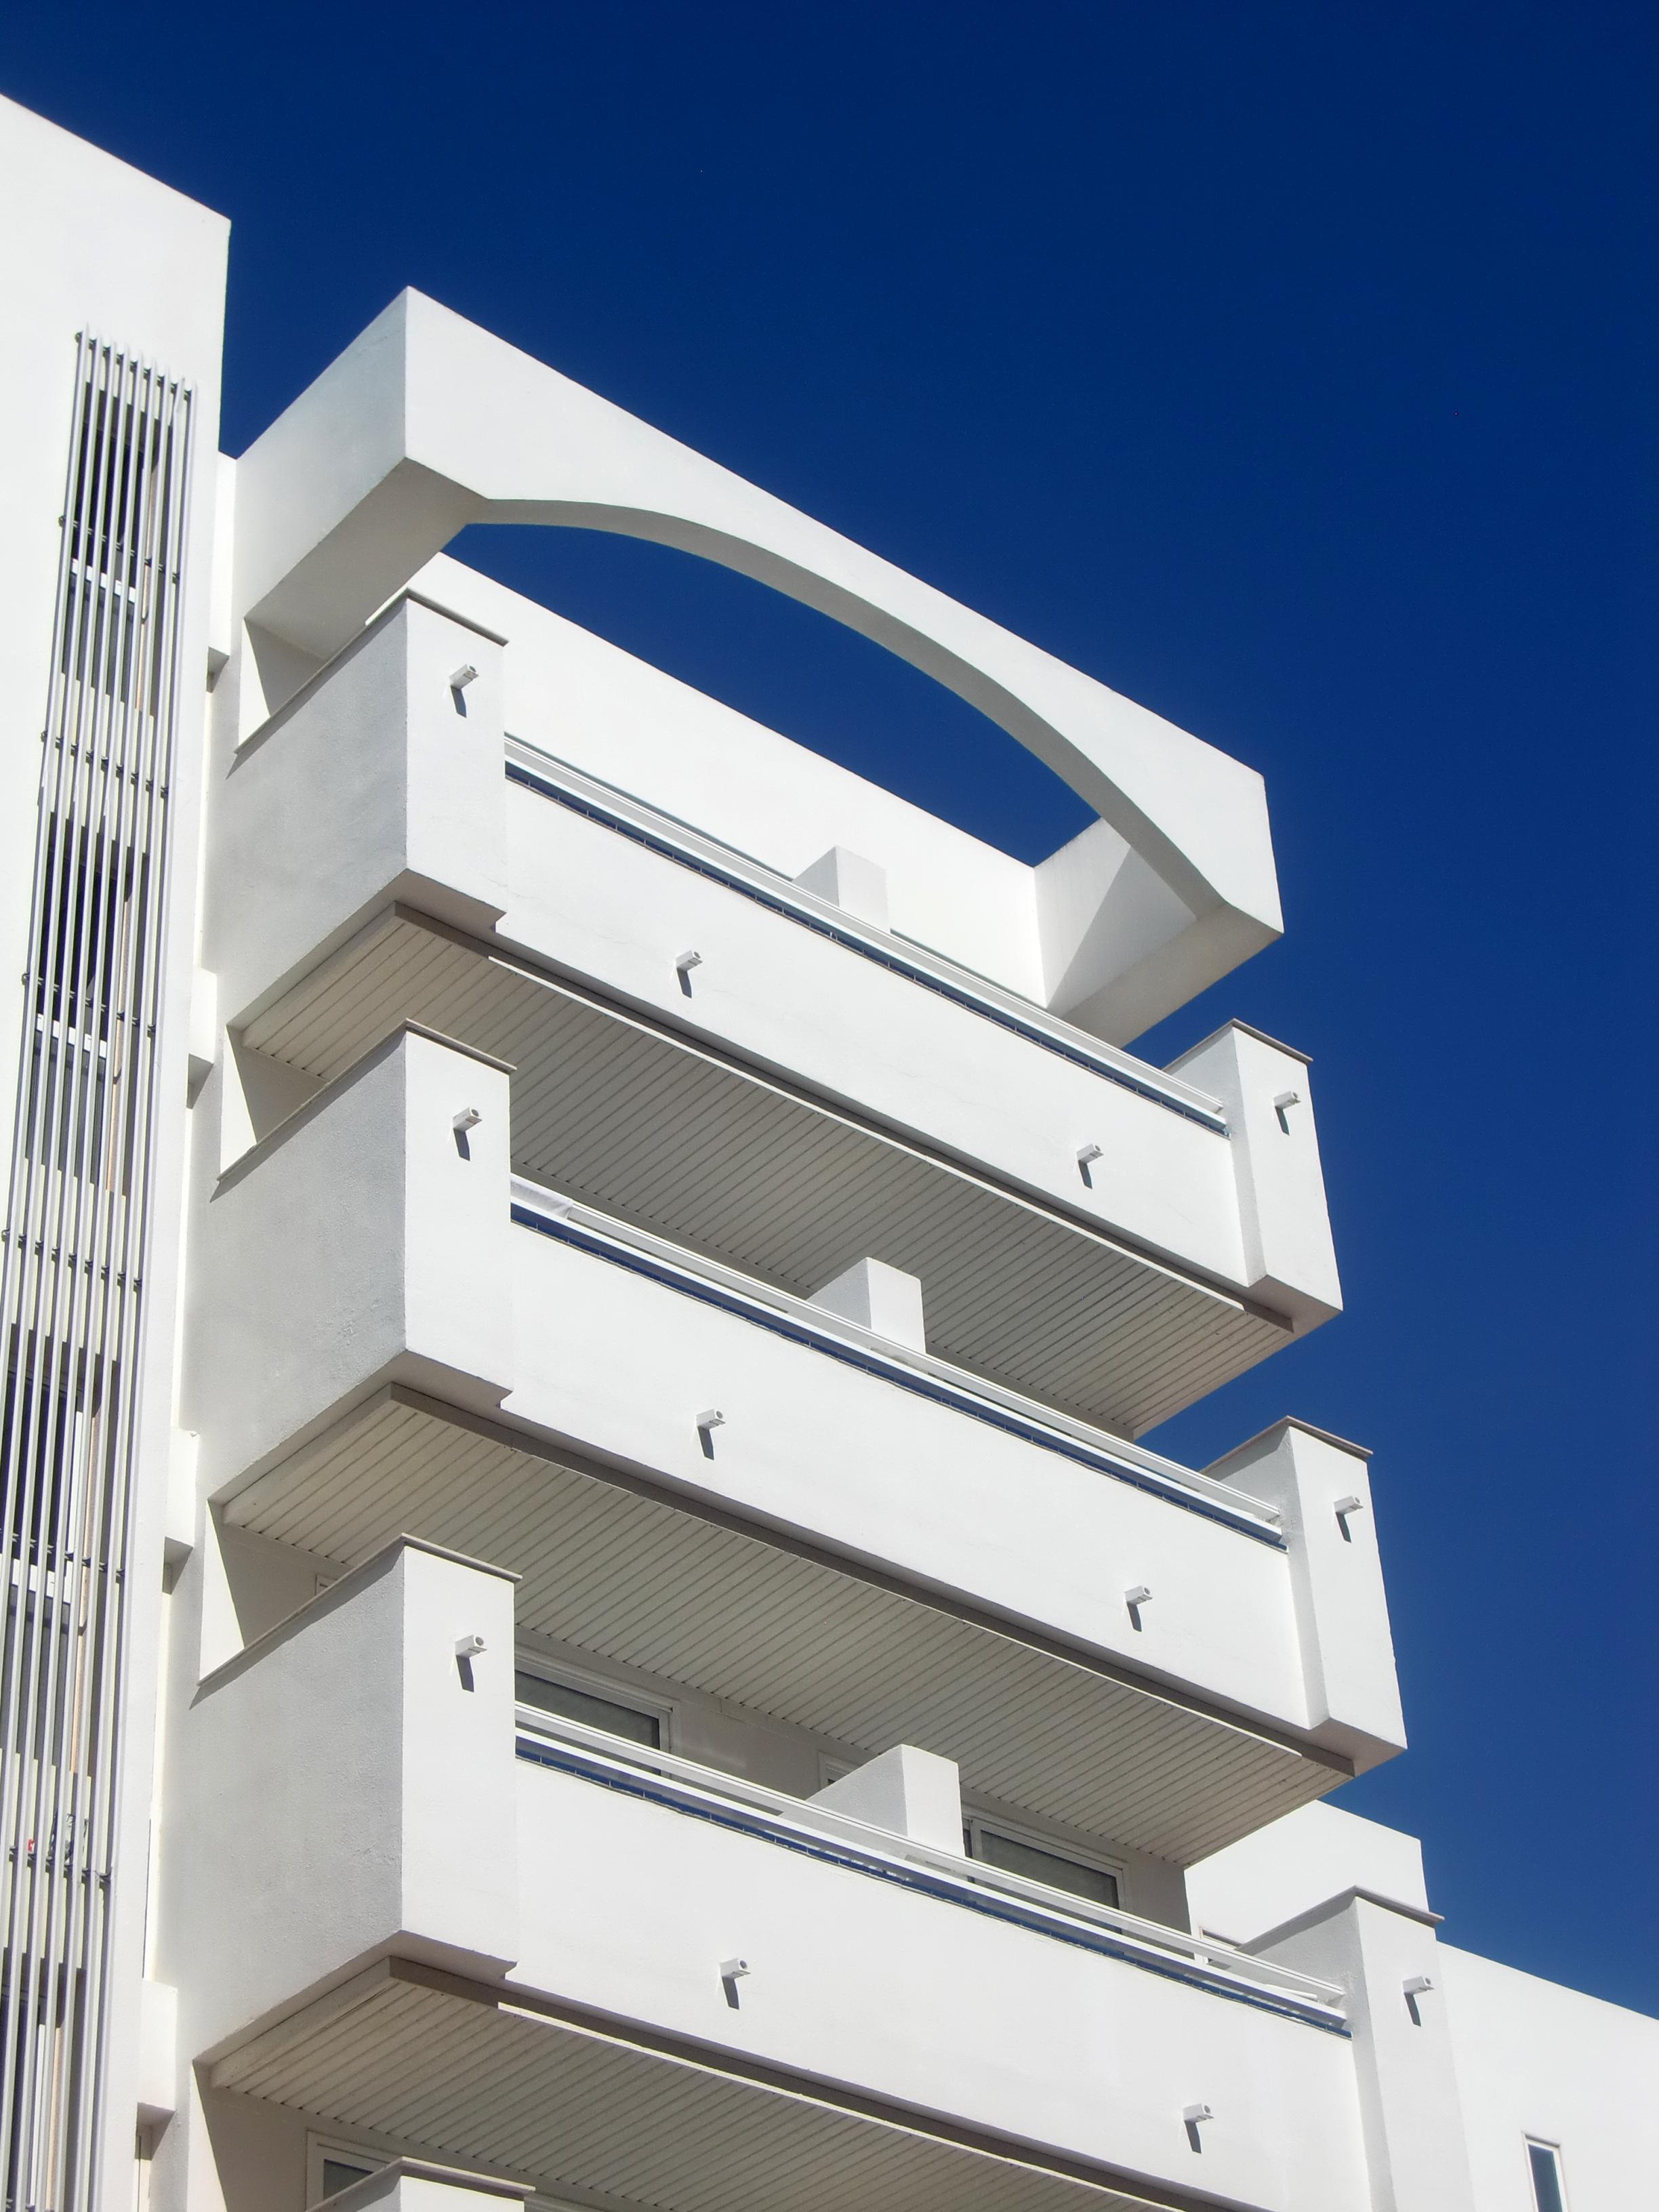 Fotos gratis arquitectura estructura casa rascacielos for Imagenes de arquitectura minimalista